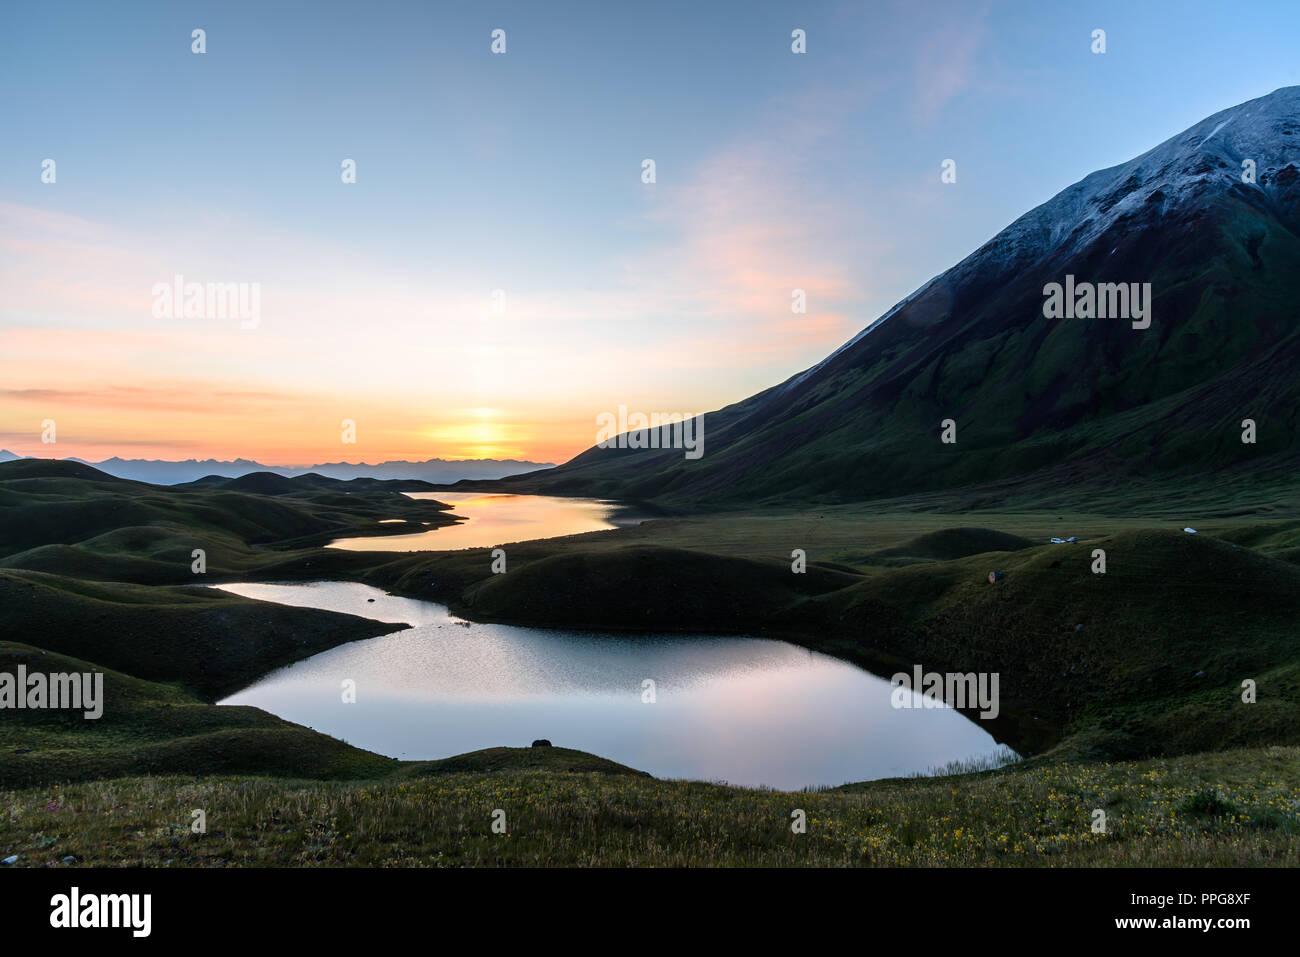 mountain lakes around Peak Lenin valley at sunrise, Kyrgyzstan Stock Photo